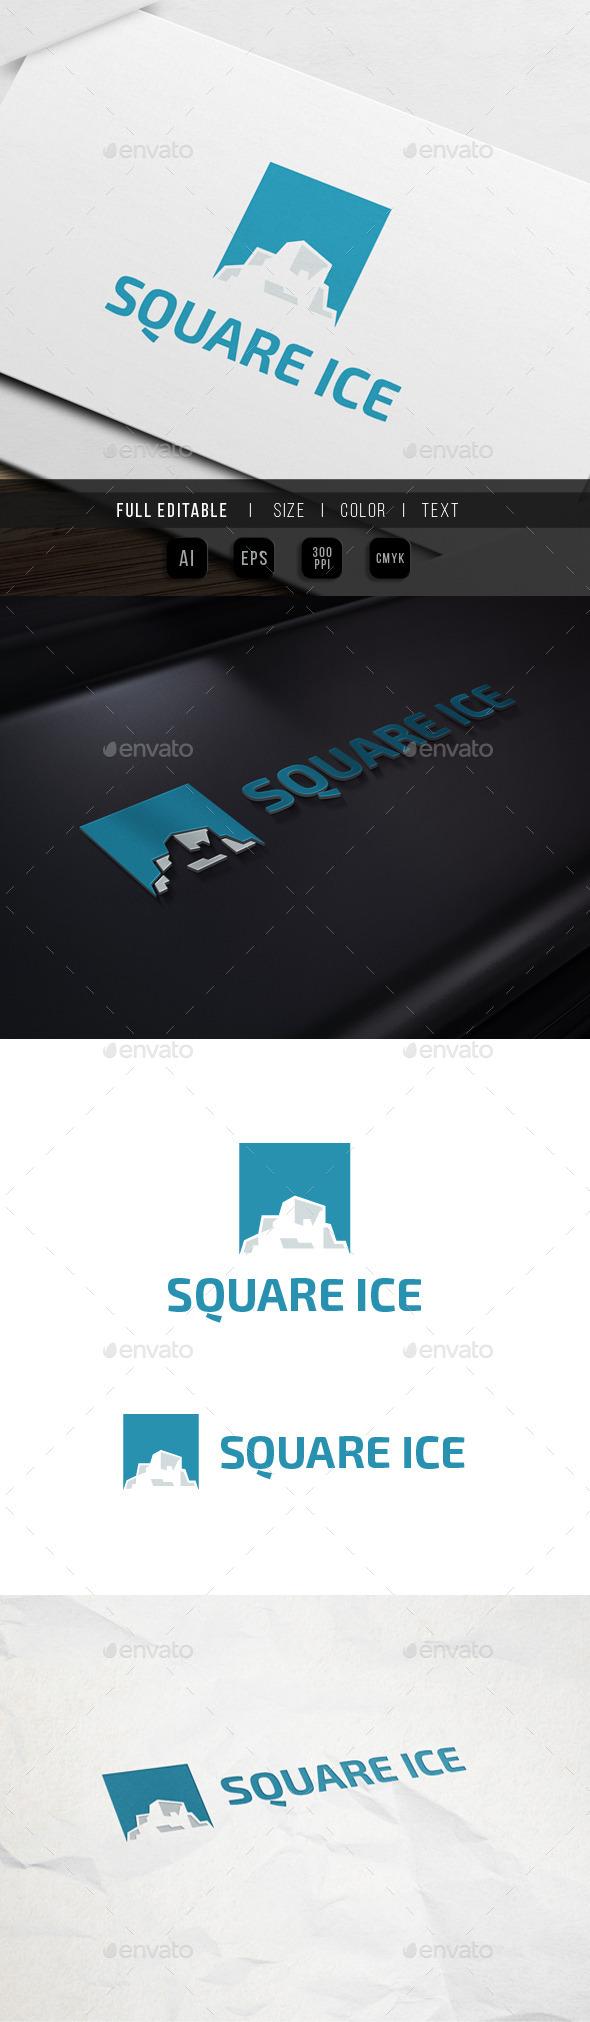 Ice Mountain - Square Climbing